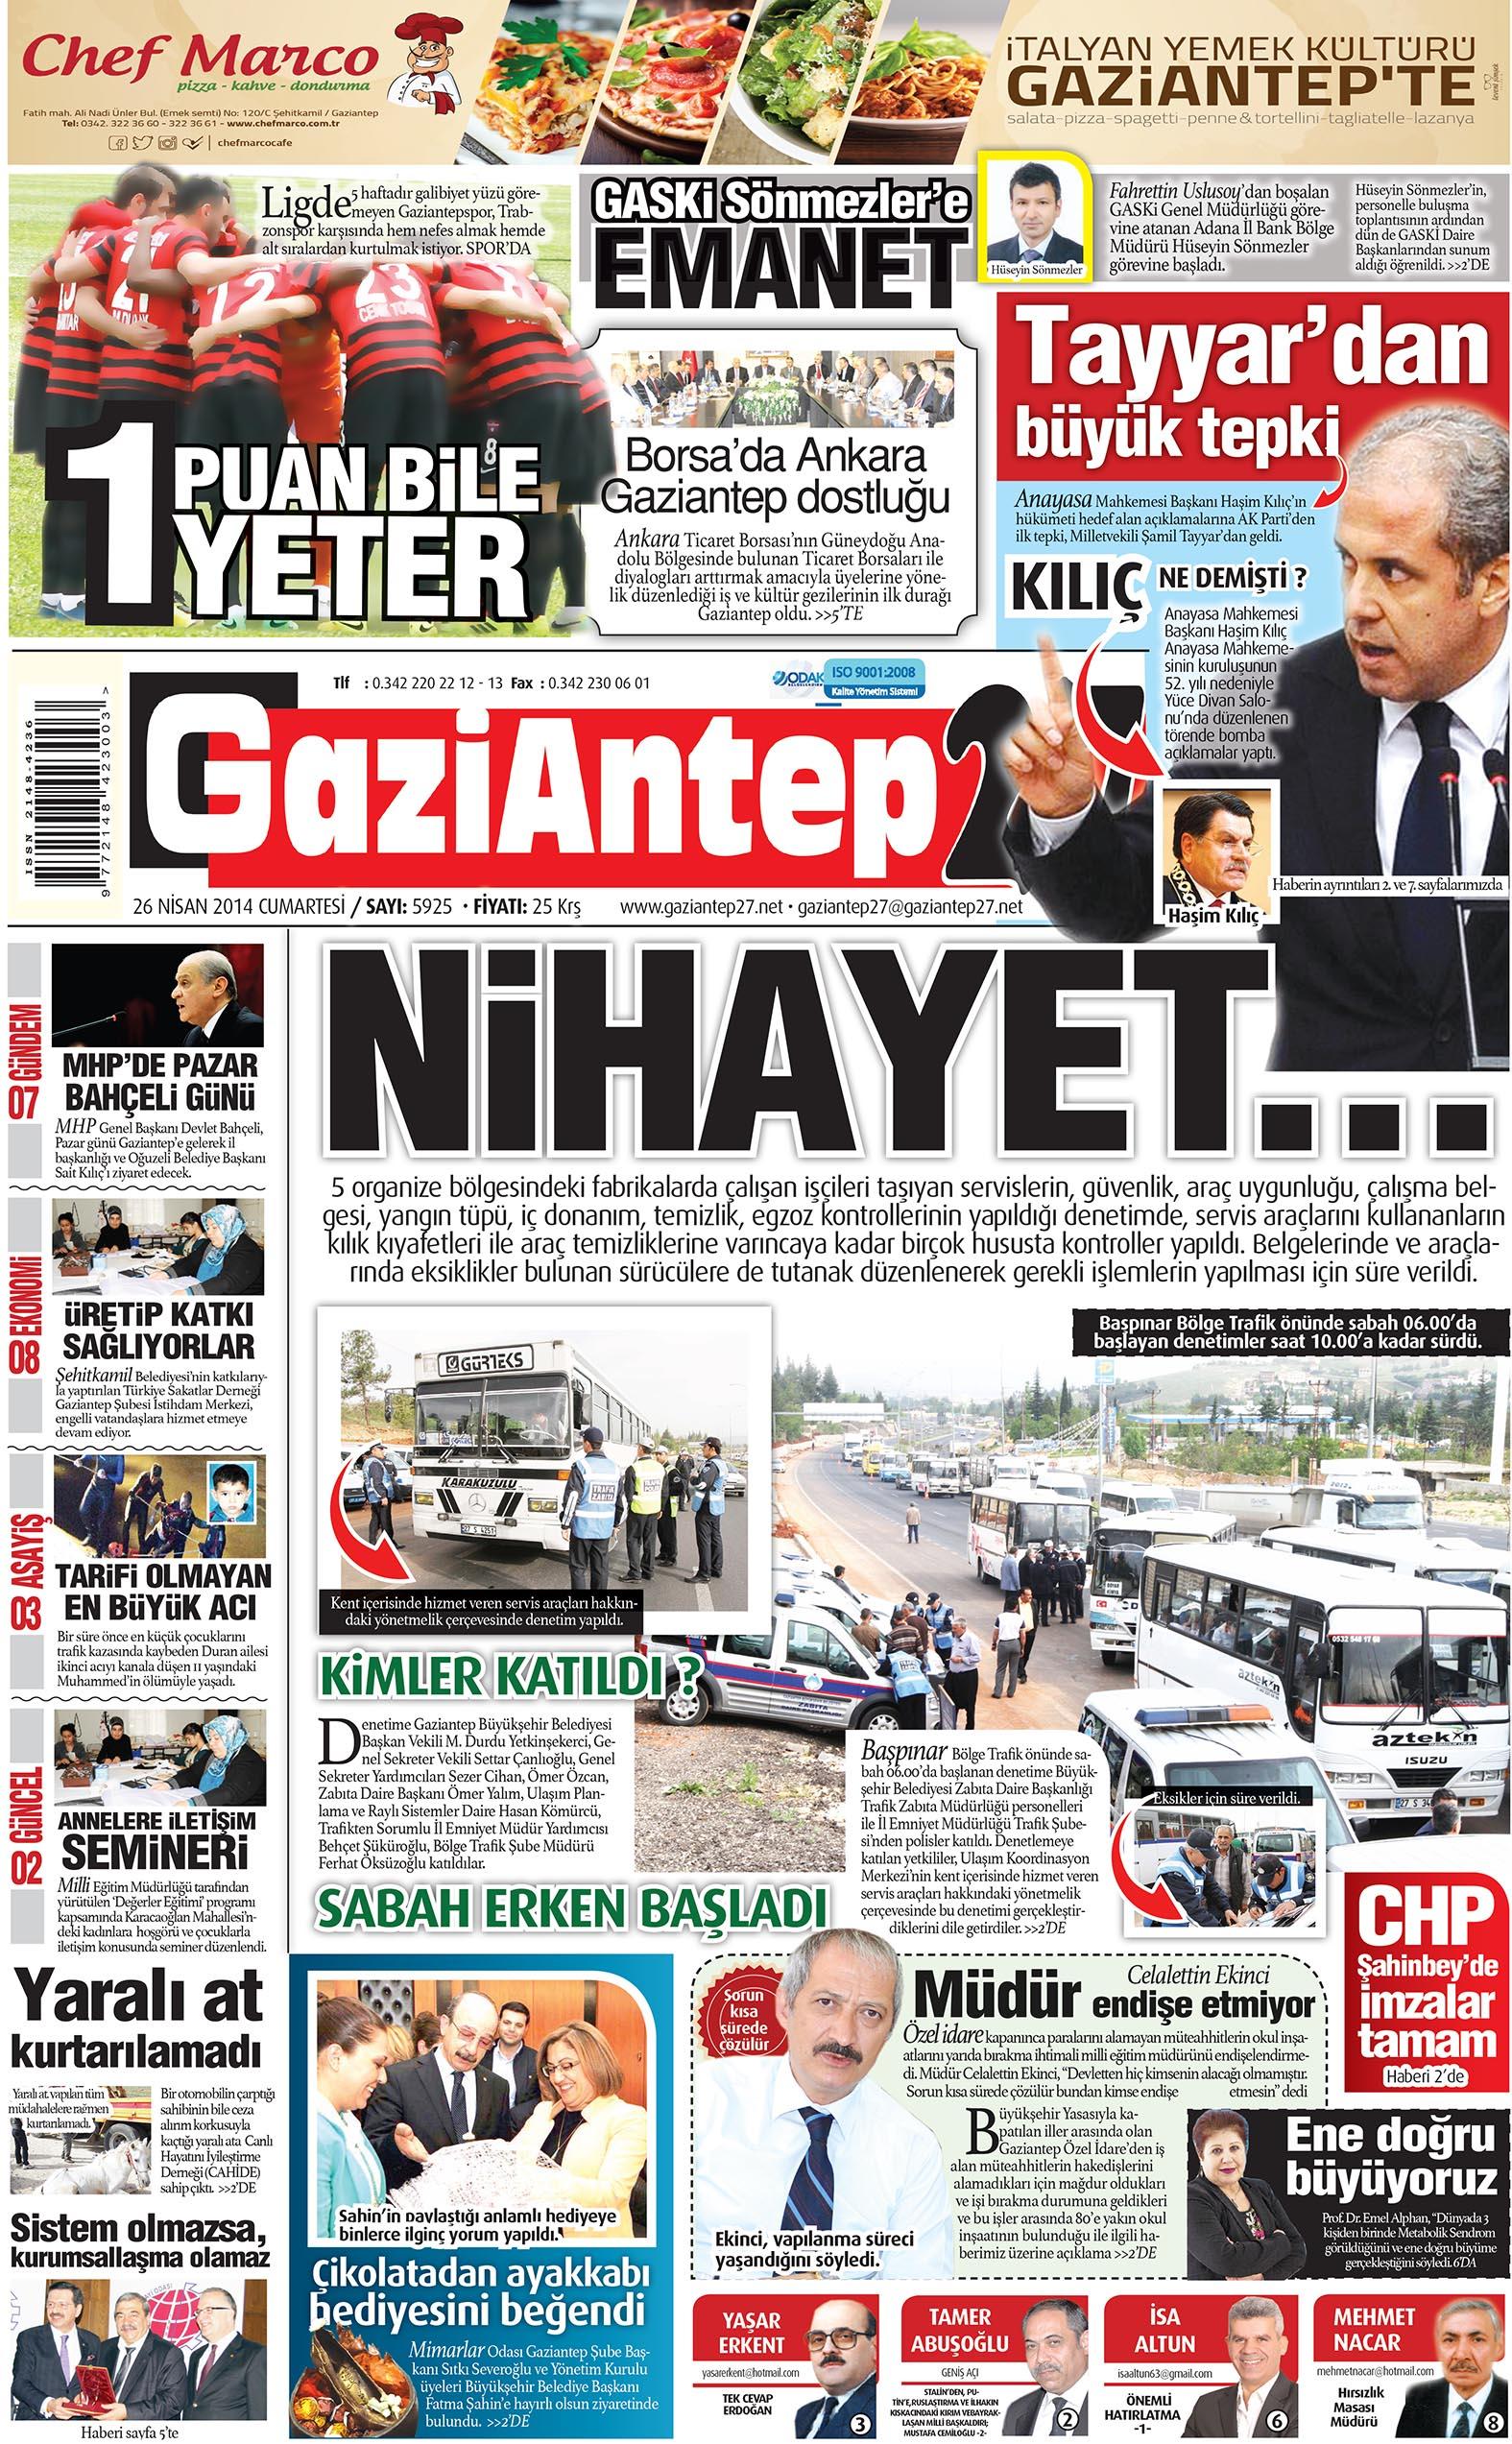 26 Nisan 2014 sayfalar 1